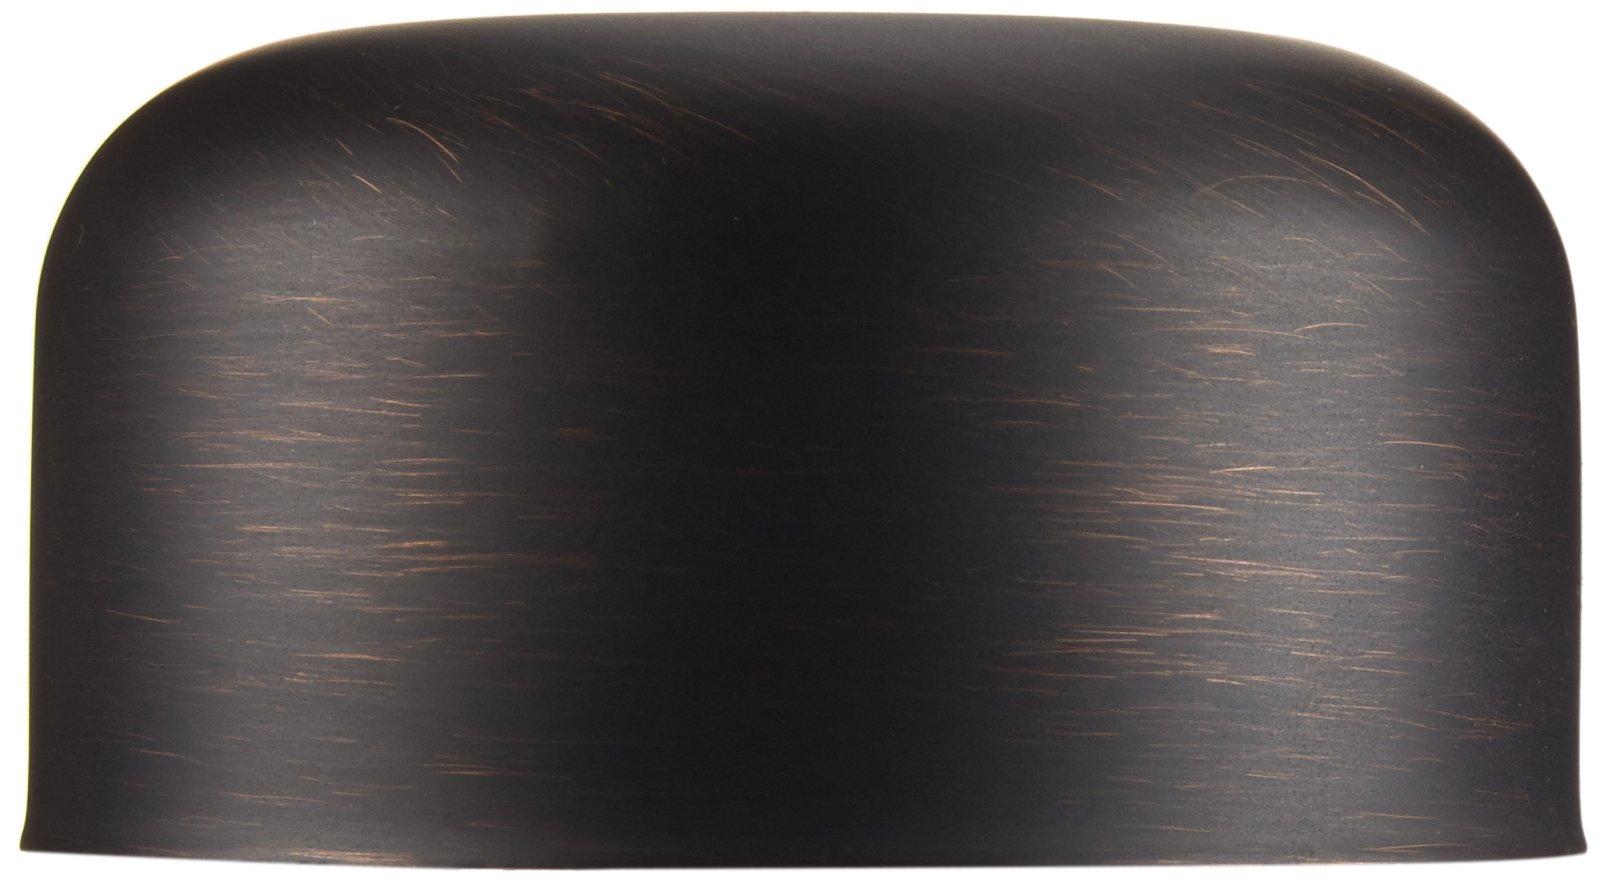 Jones Stephens E0415WB Escutcheon Old World Bronze 1-1/2-Inch Tubular Box Pattern by Jones Stephens Corporation (Image #1)